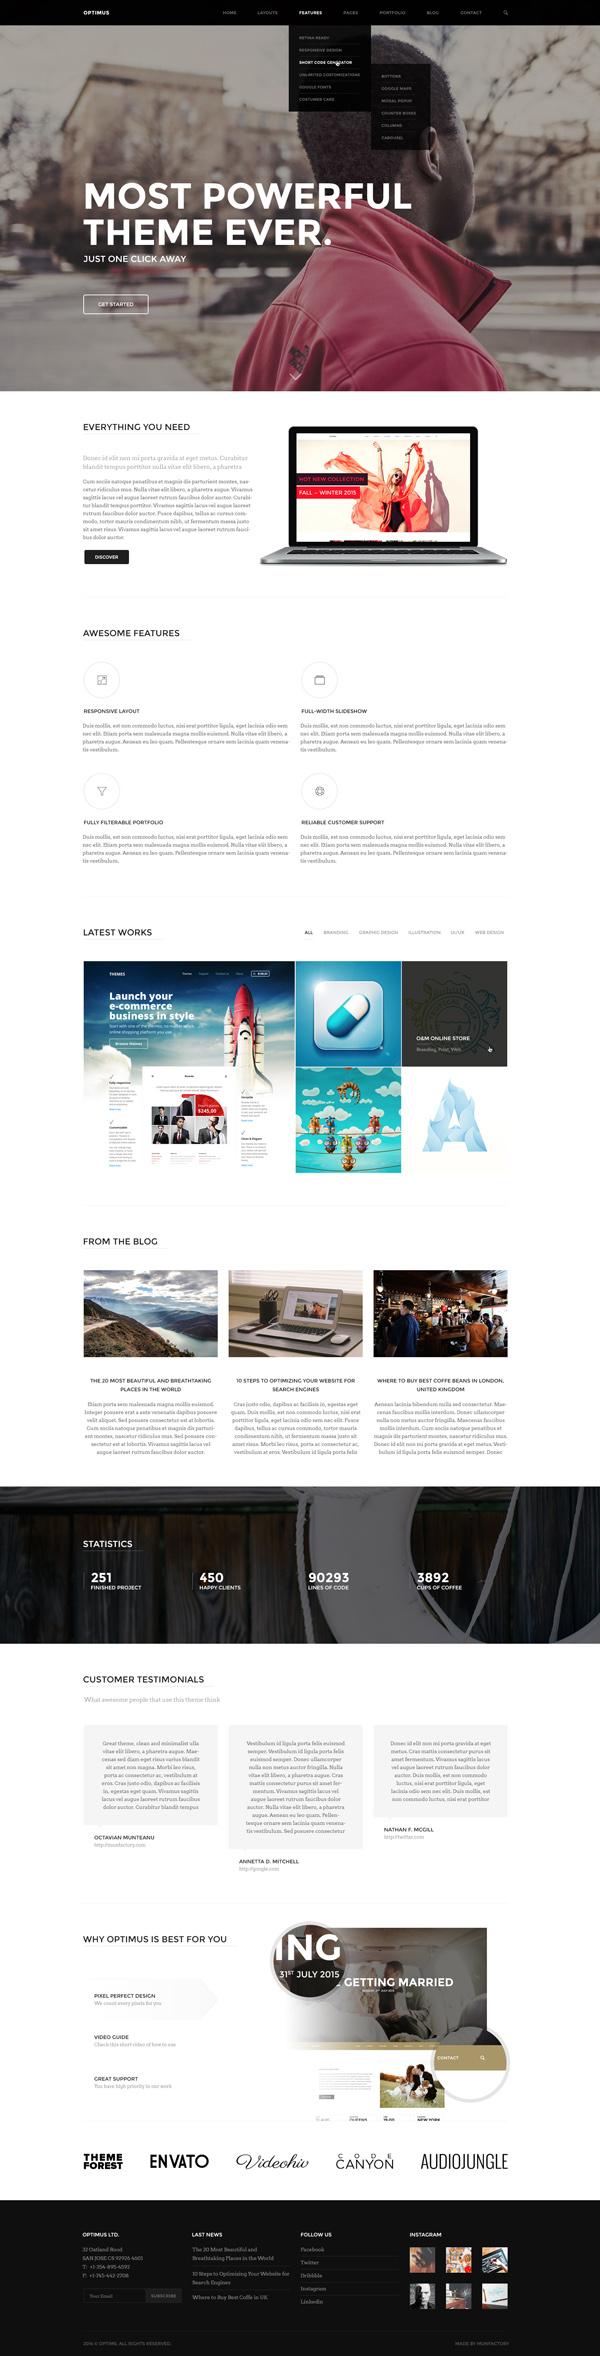 Optimus - A Super Easy to Use Multi-Concept HTML5